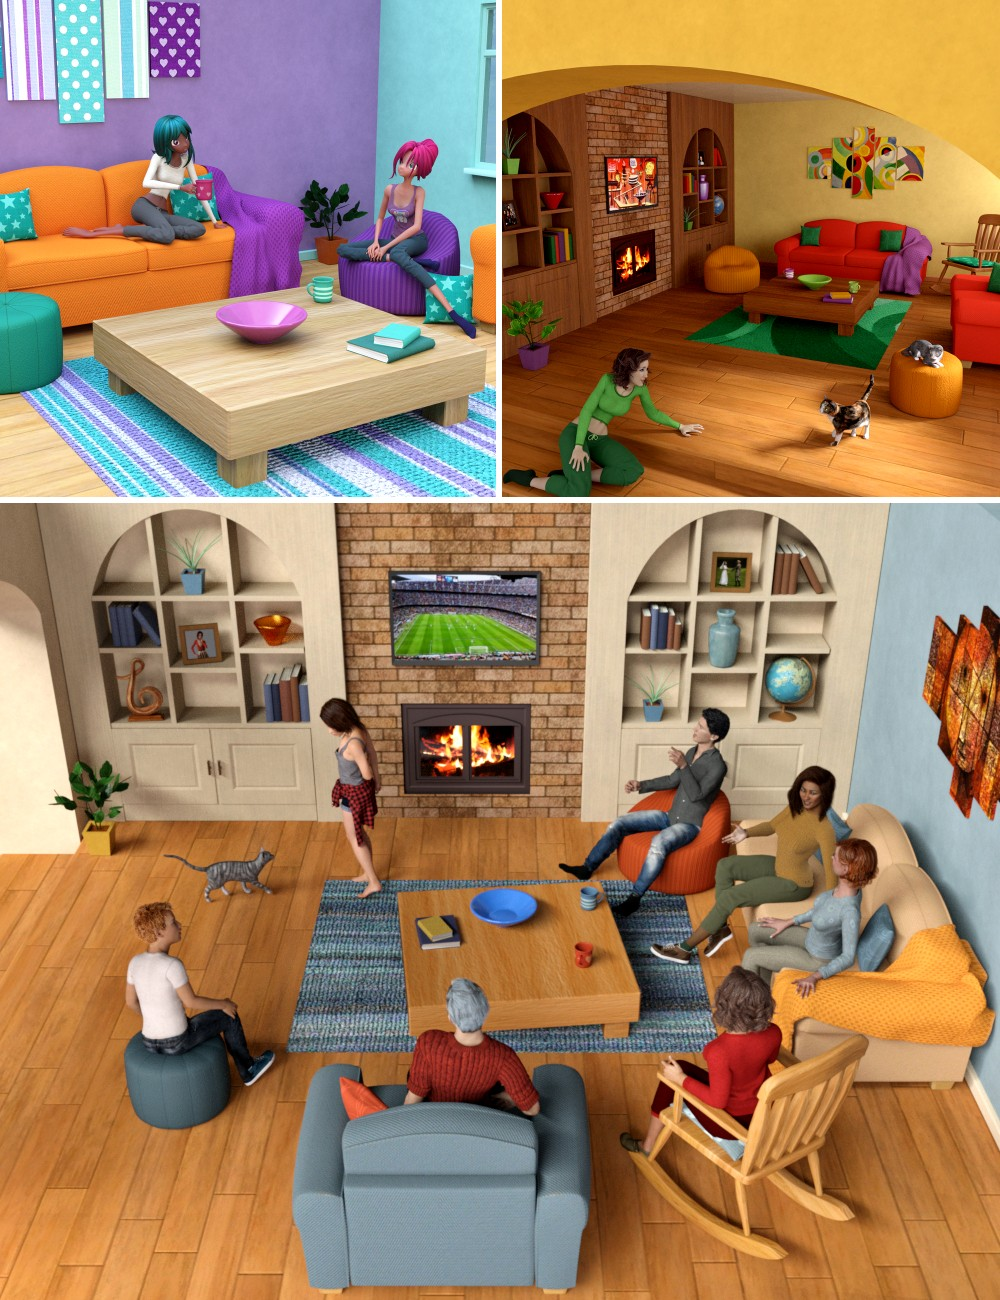 Download daz studio 3 for free daz 3d toon 2 real for Living room 2 for daz studio